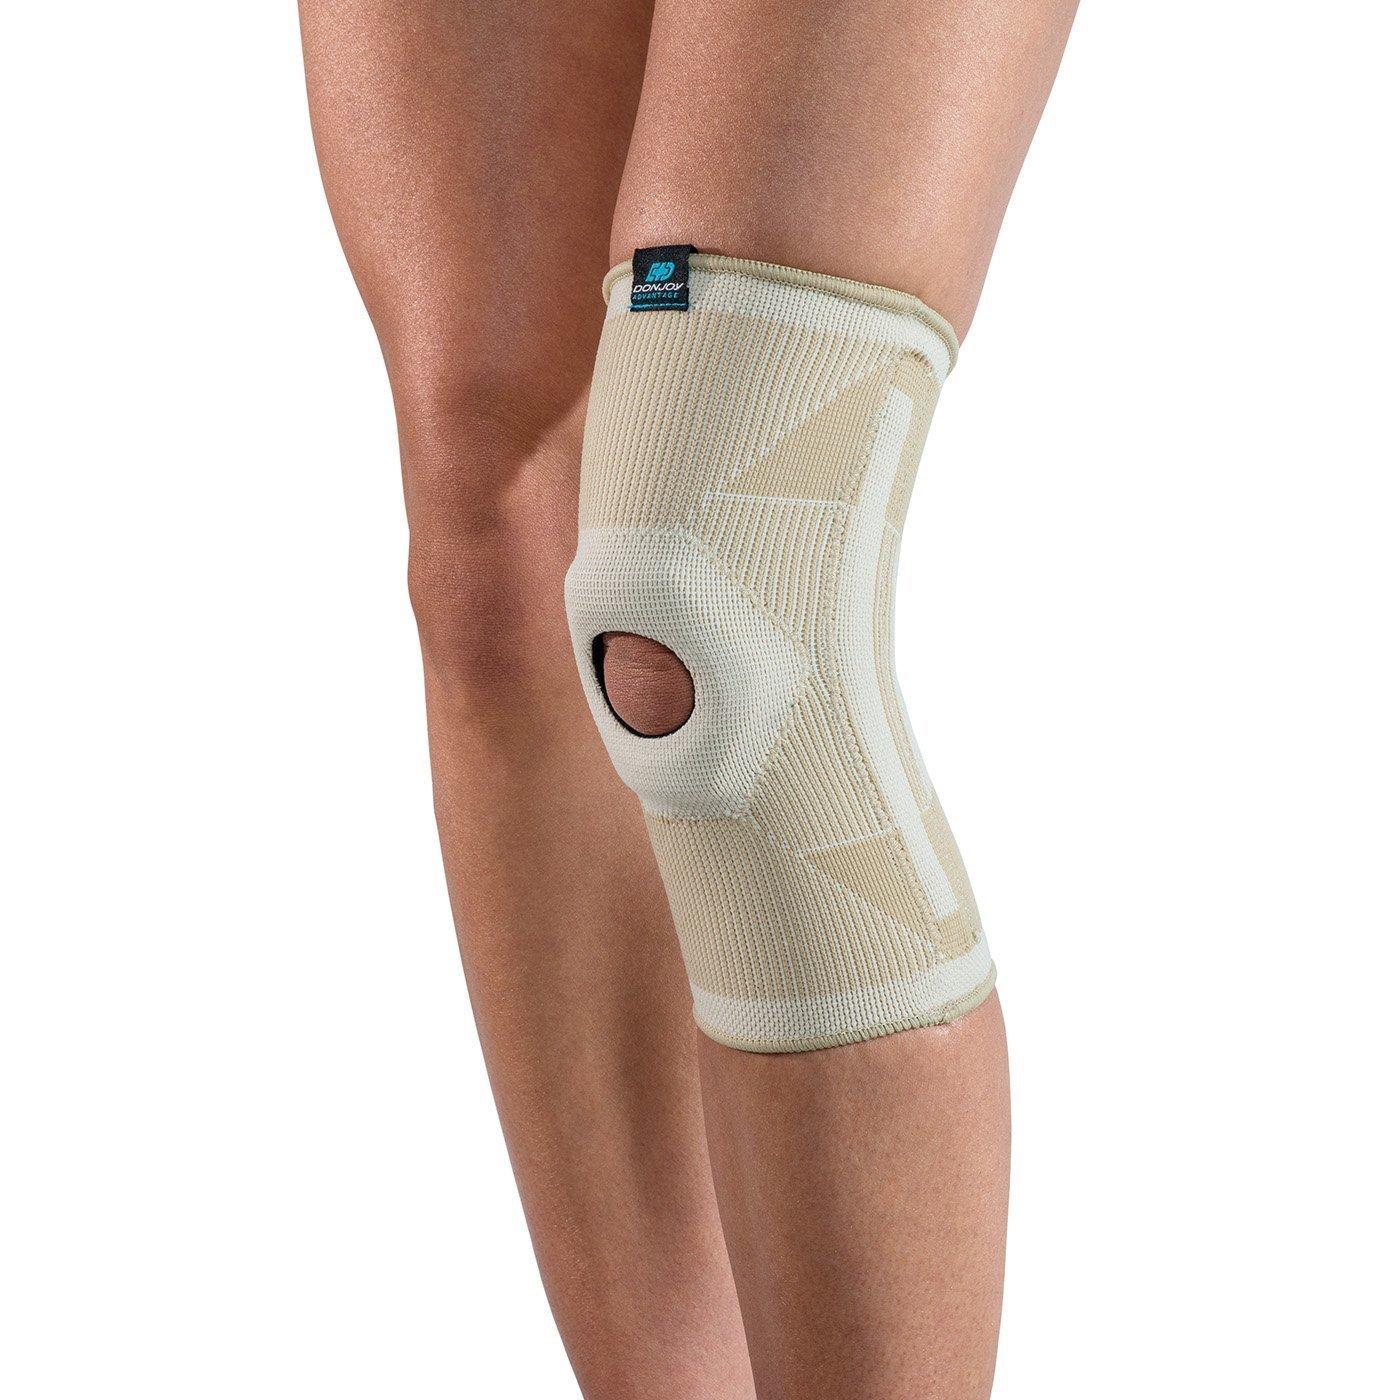 913322d725 Get Quotations · DonJoy Advantage DA161KS02-TAN-L Deluxe Elastic Knee for  Sprains, Strains, Swelling